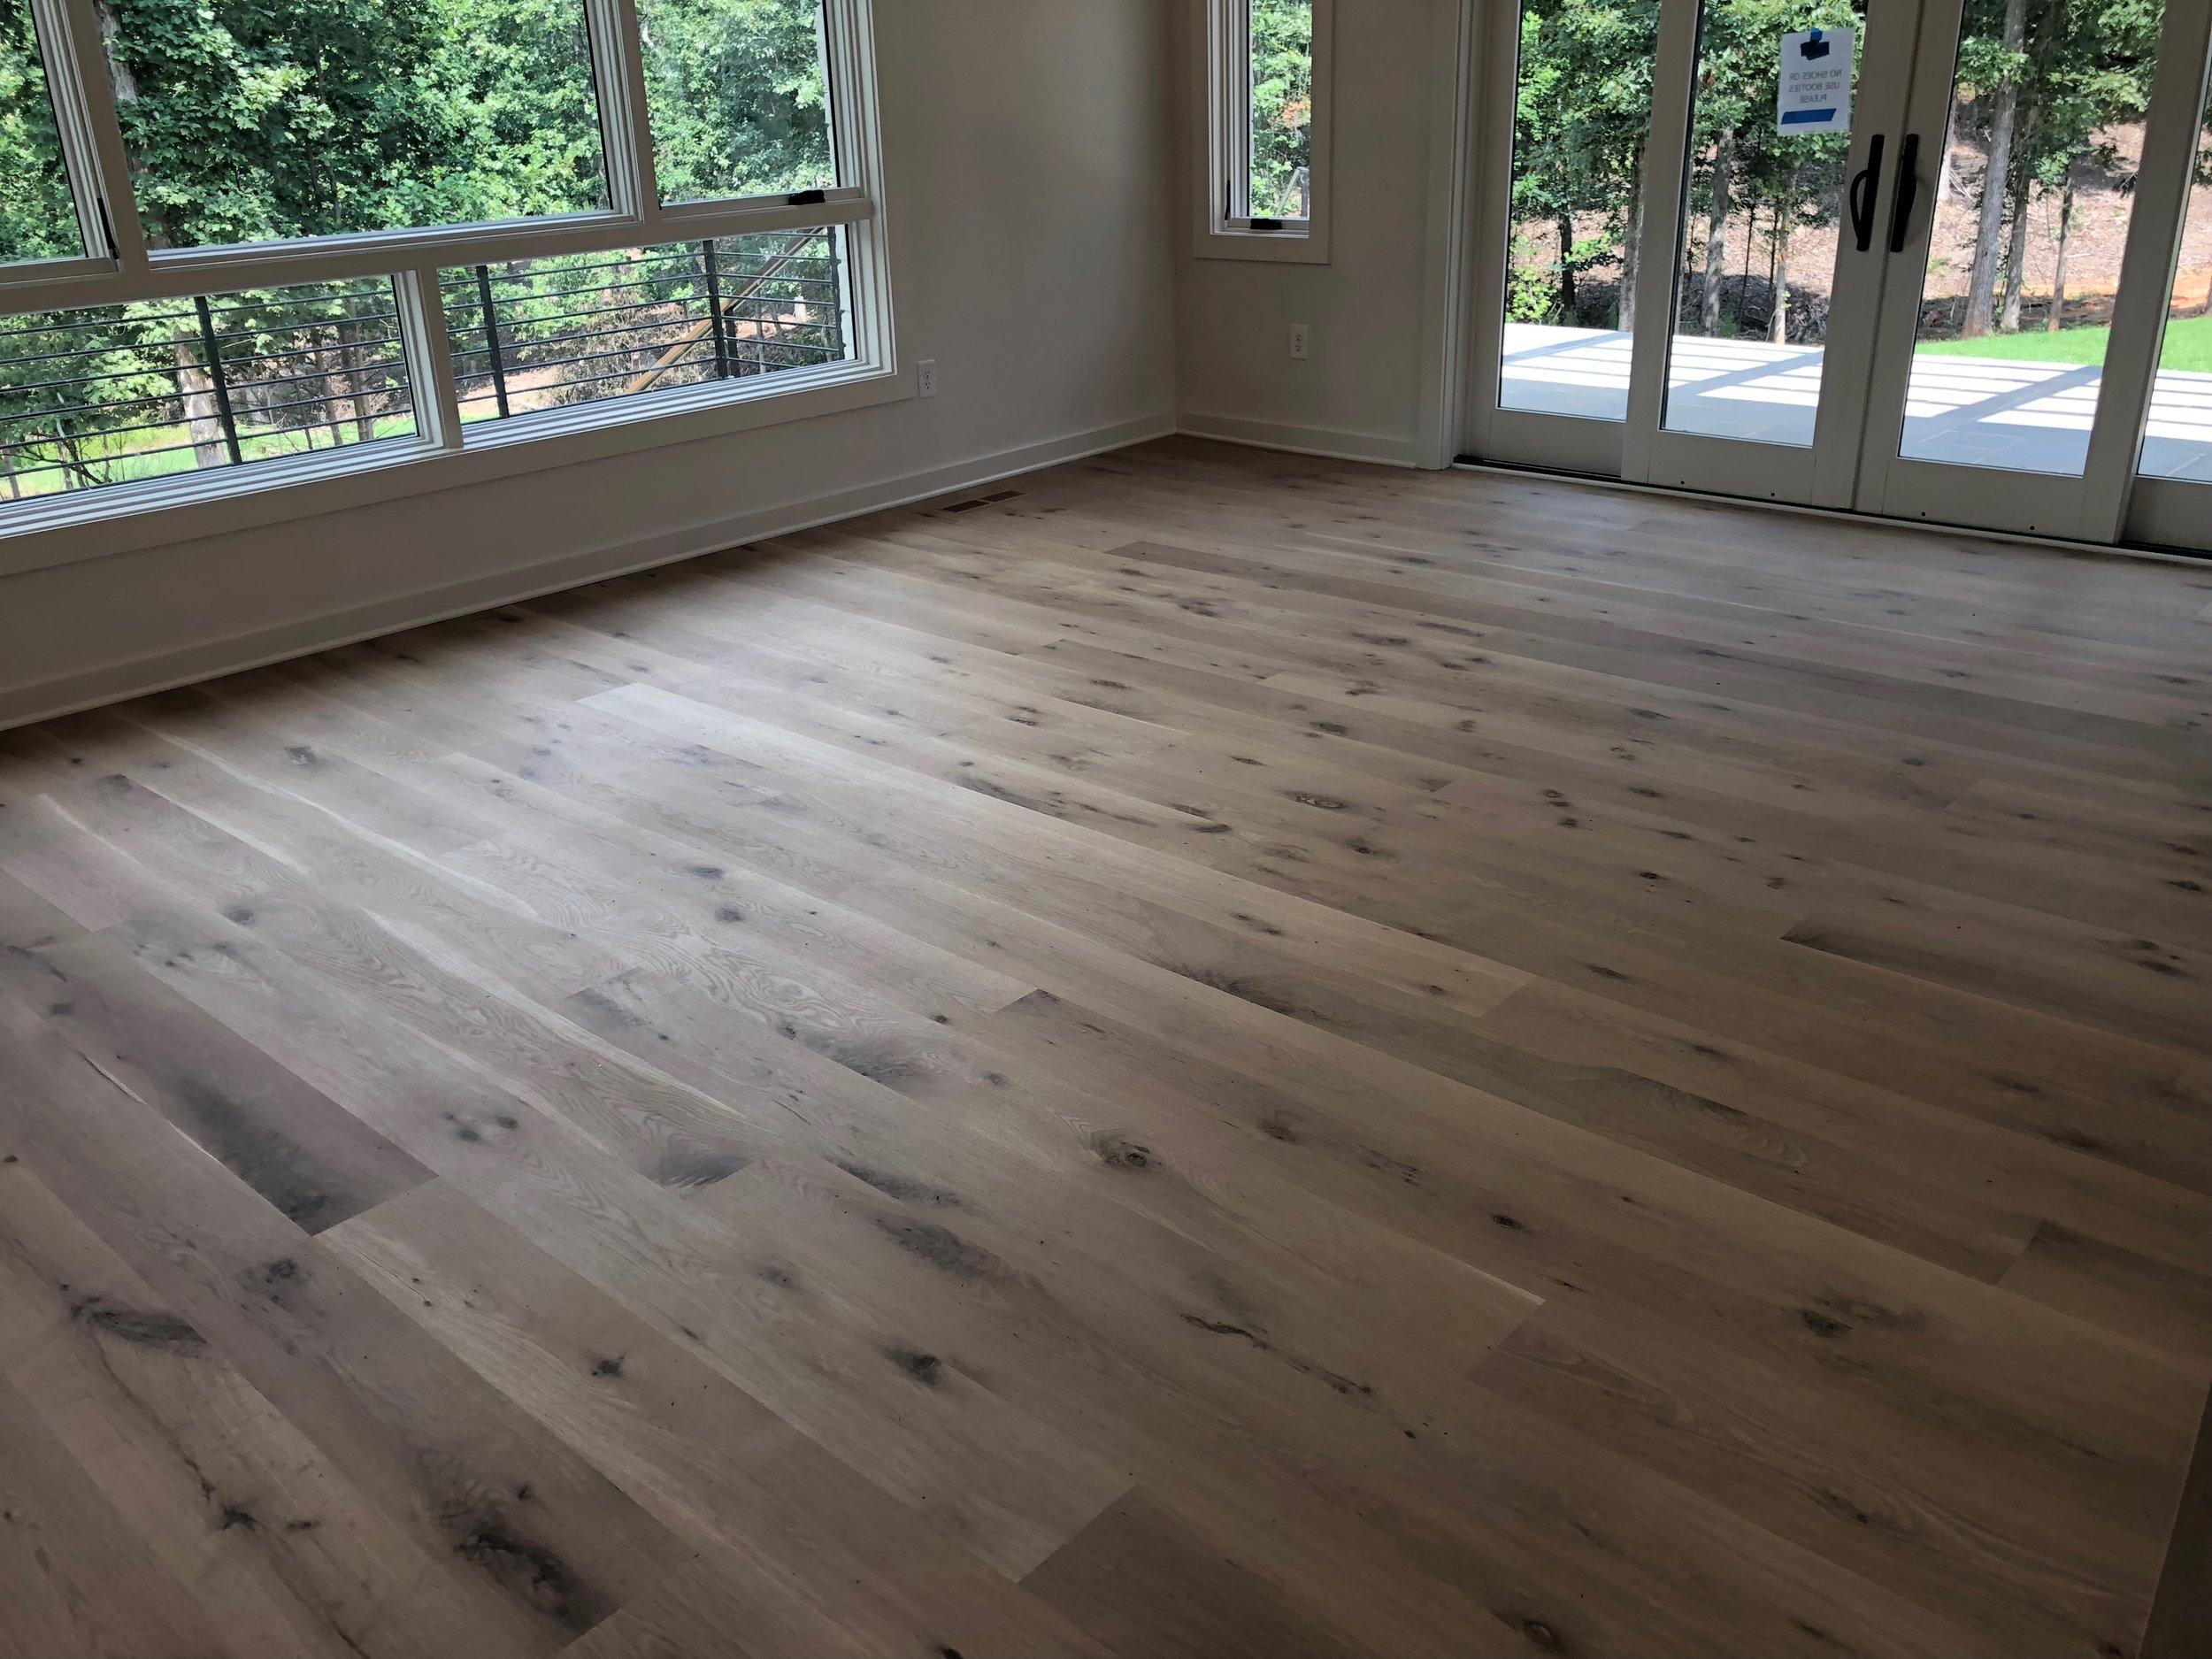 1x8 Rustic White Oak Flooring